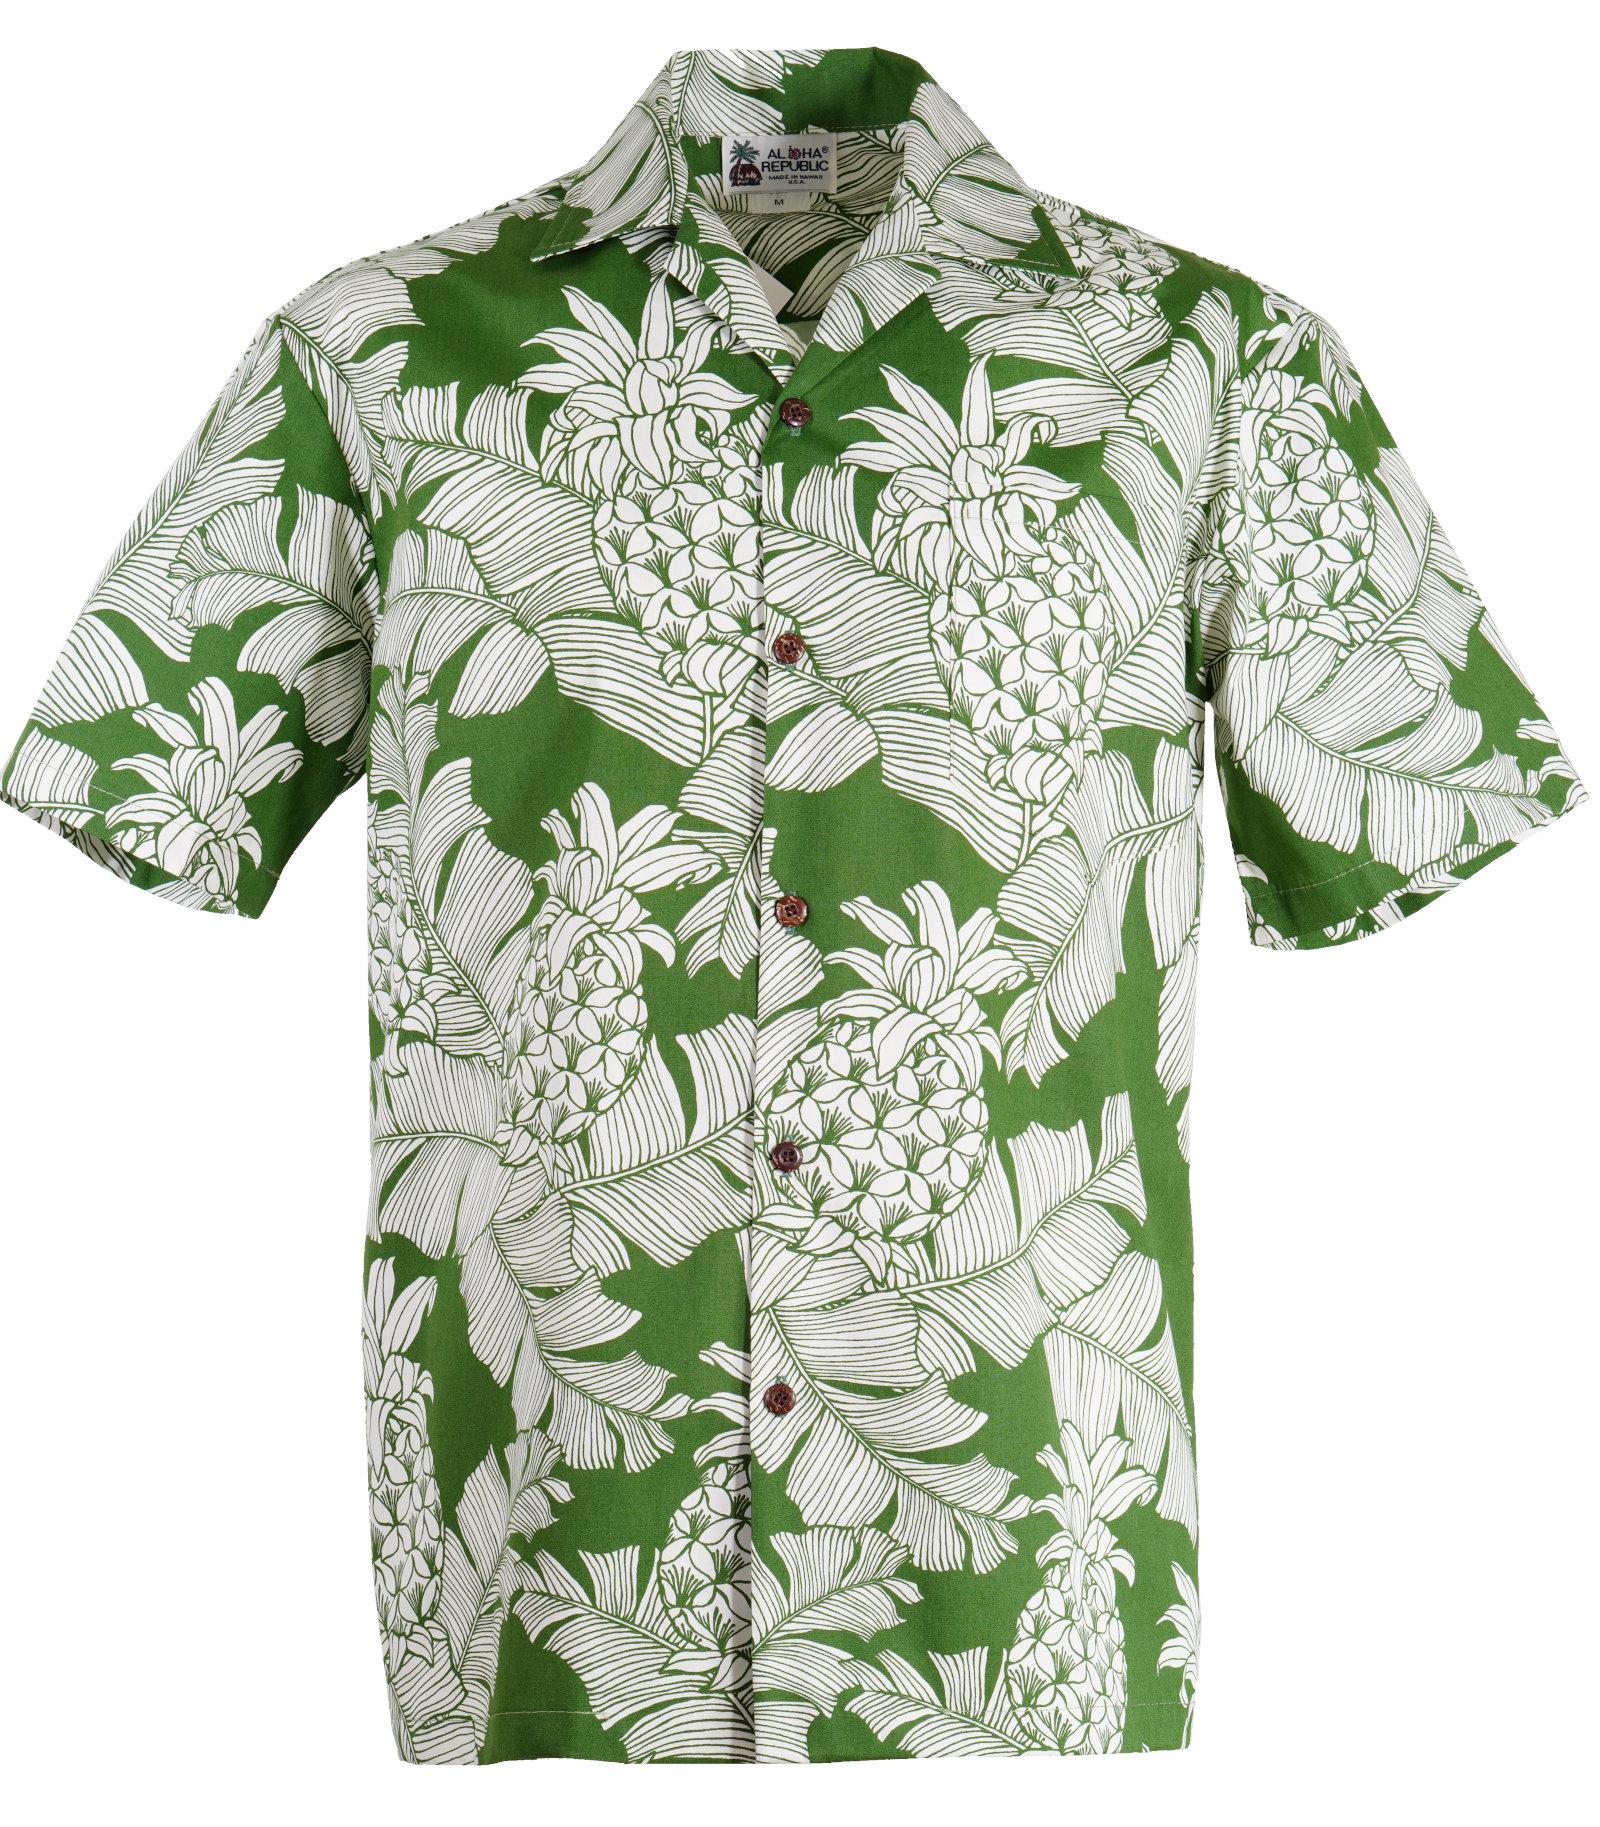 Original Hawaiihemd -FUNANAS-